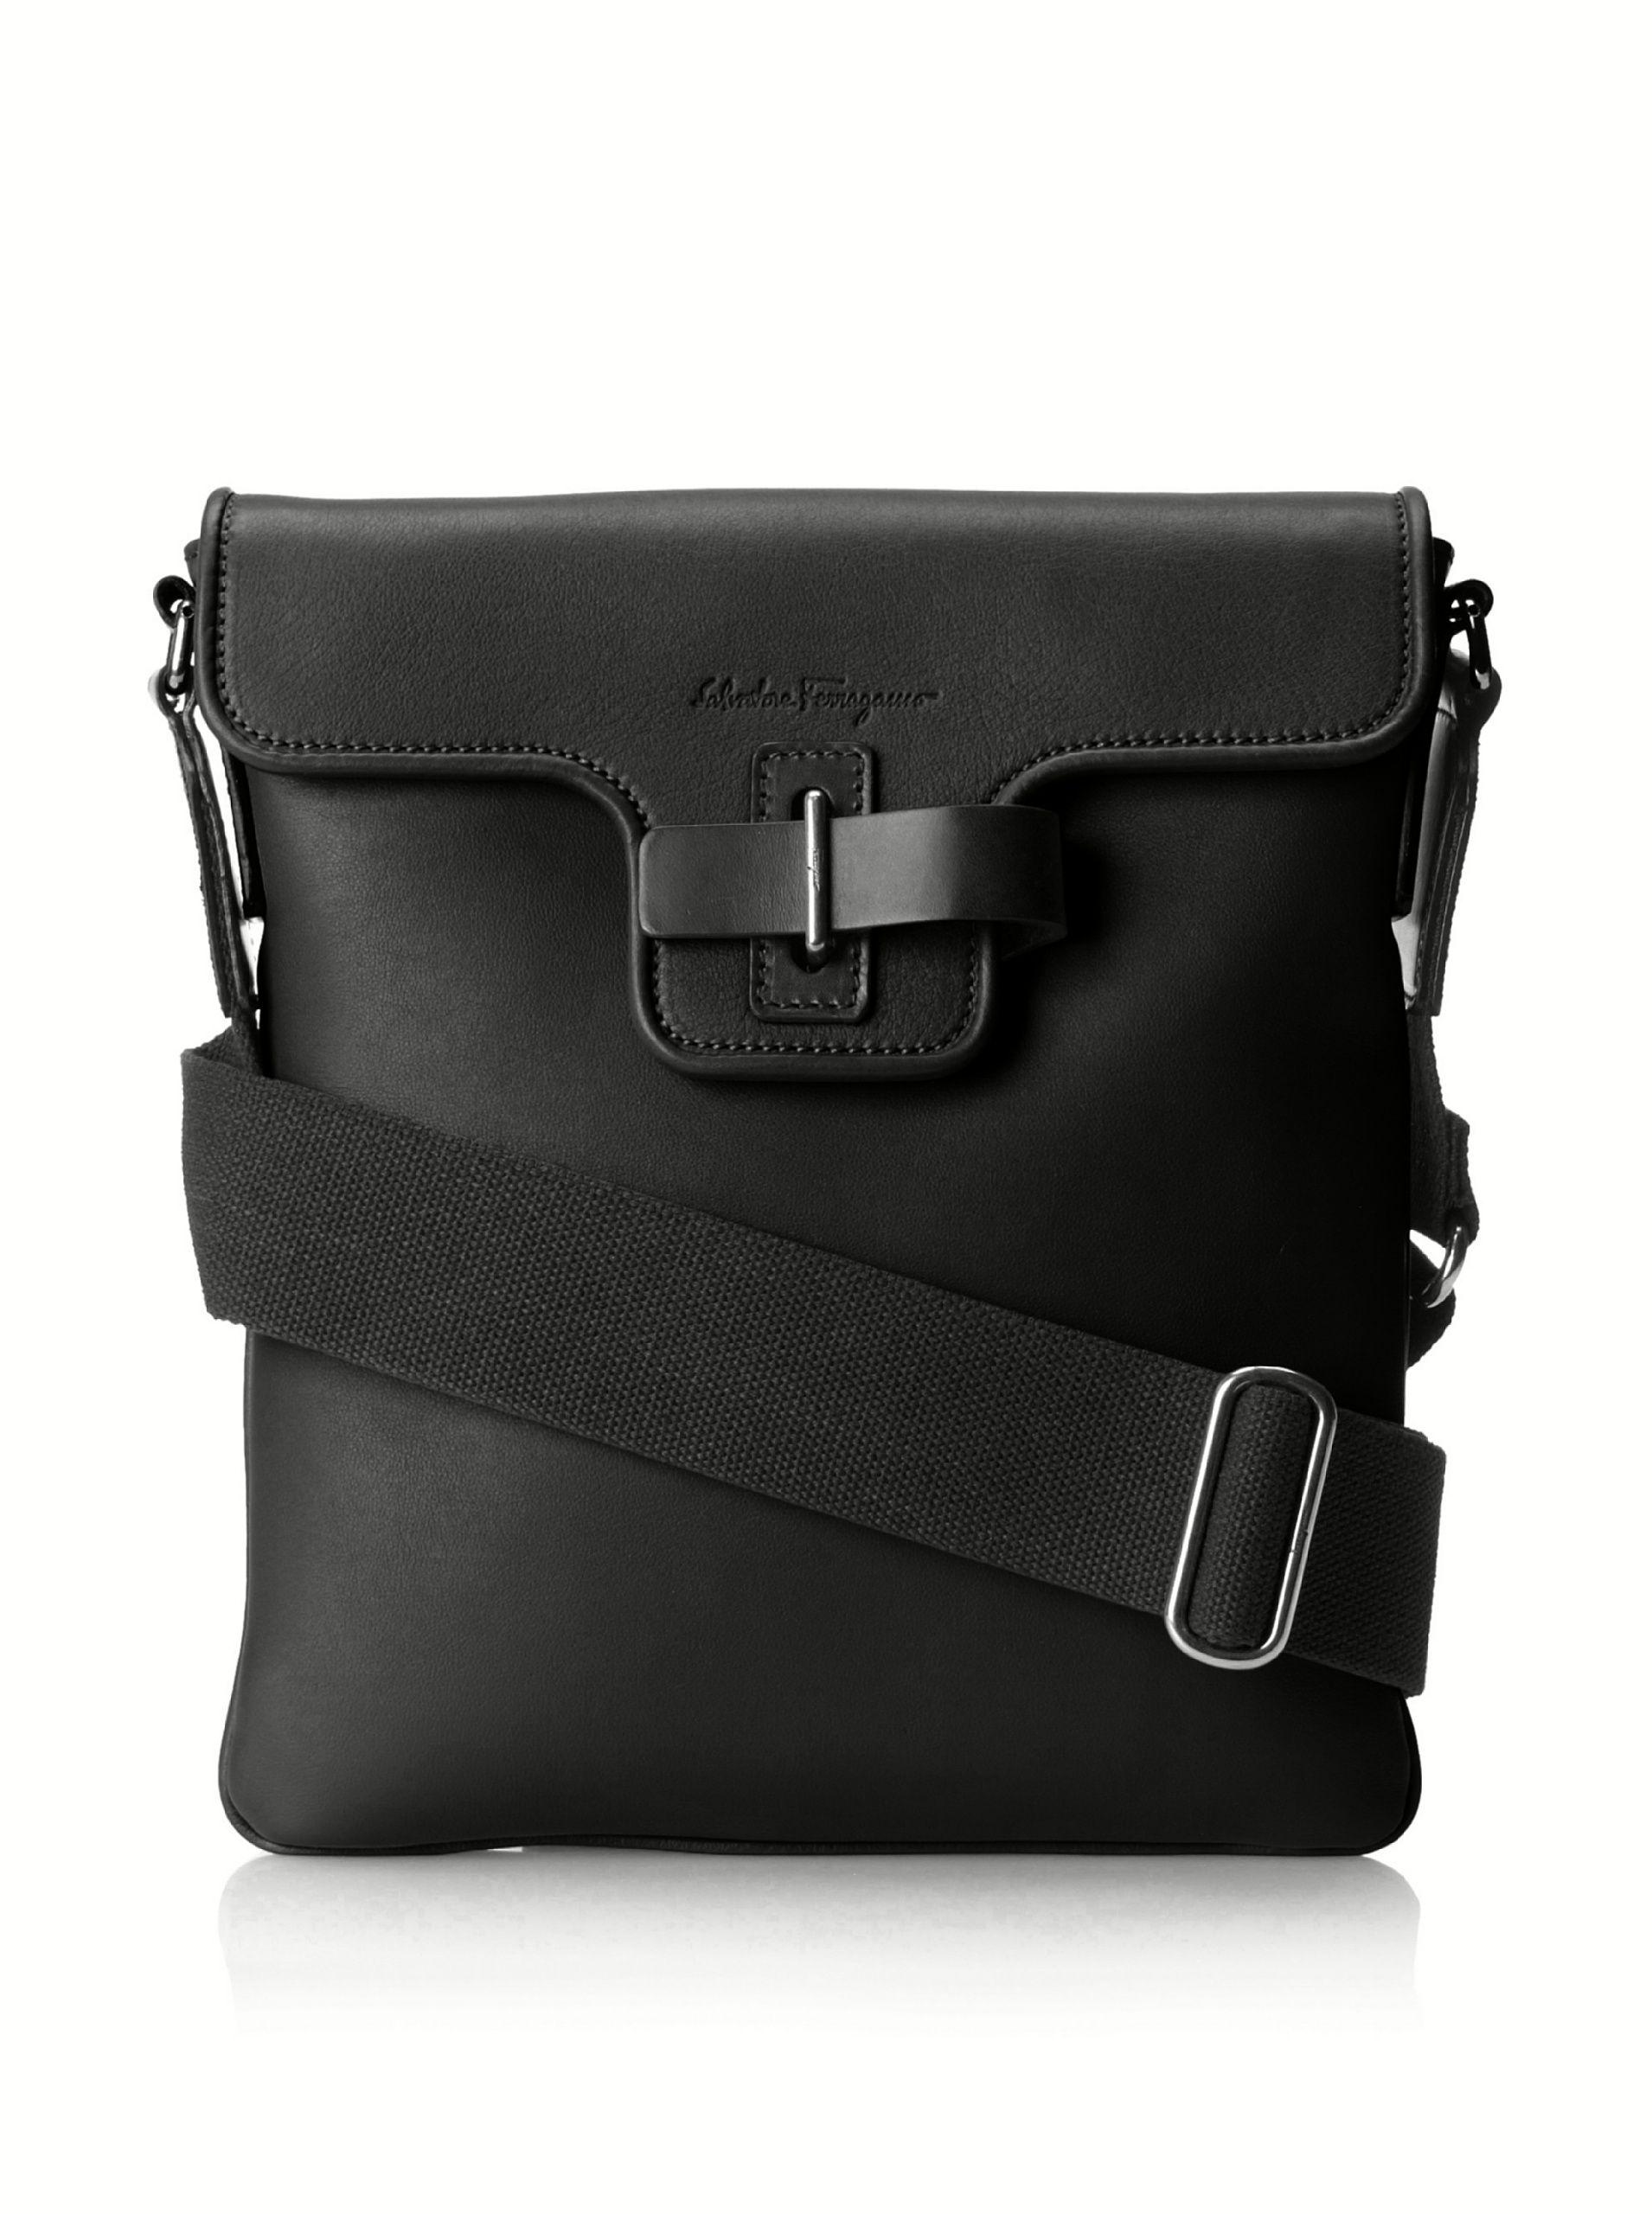 Salvatore Ferragamo Men s Cross-Body Bag at MYHABIT Casual Bags 4840118f877ef